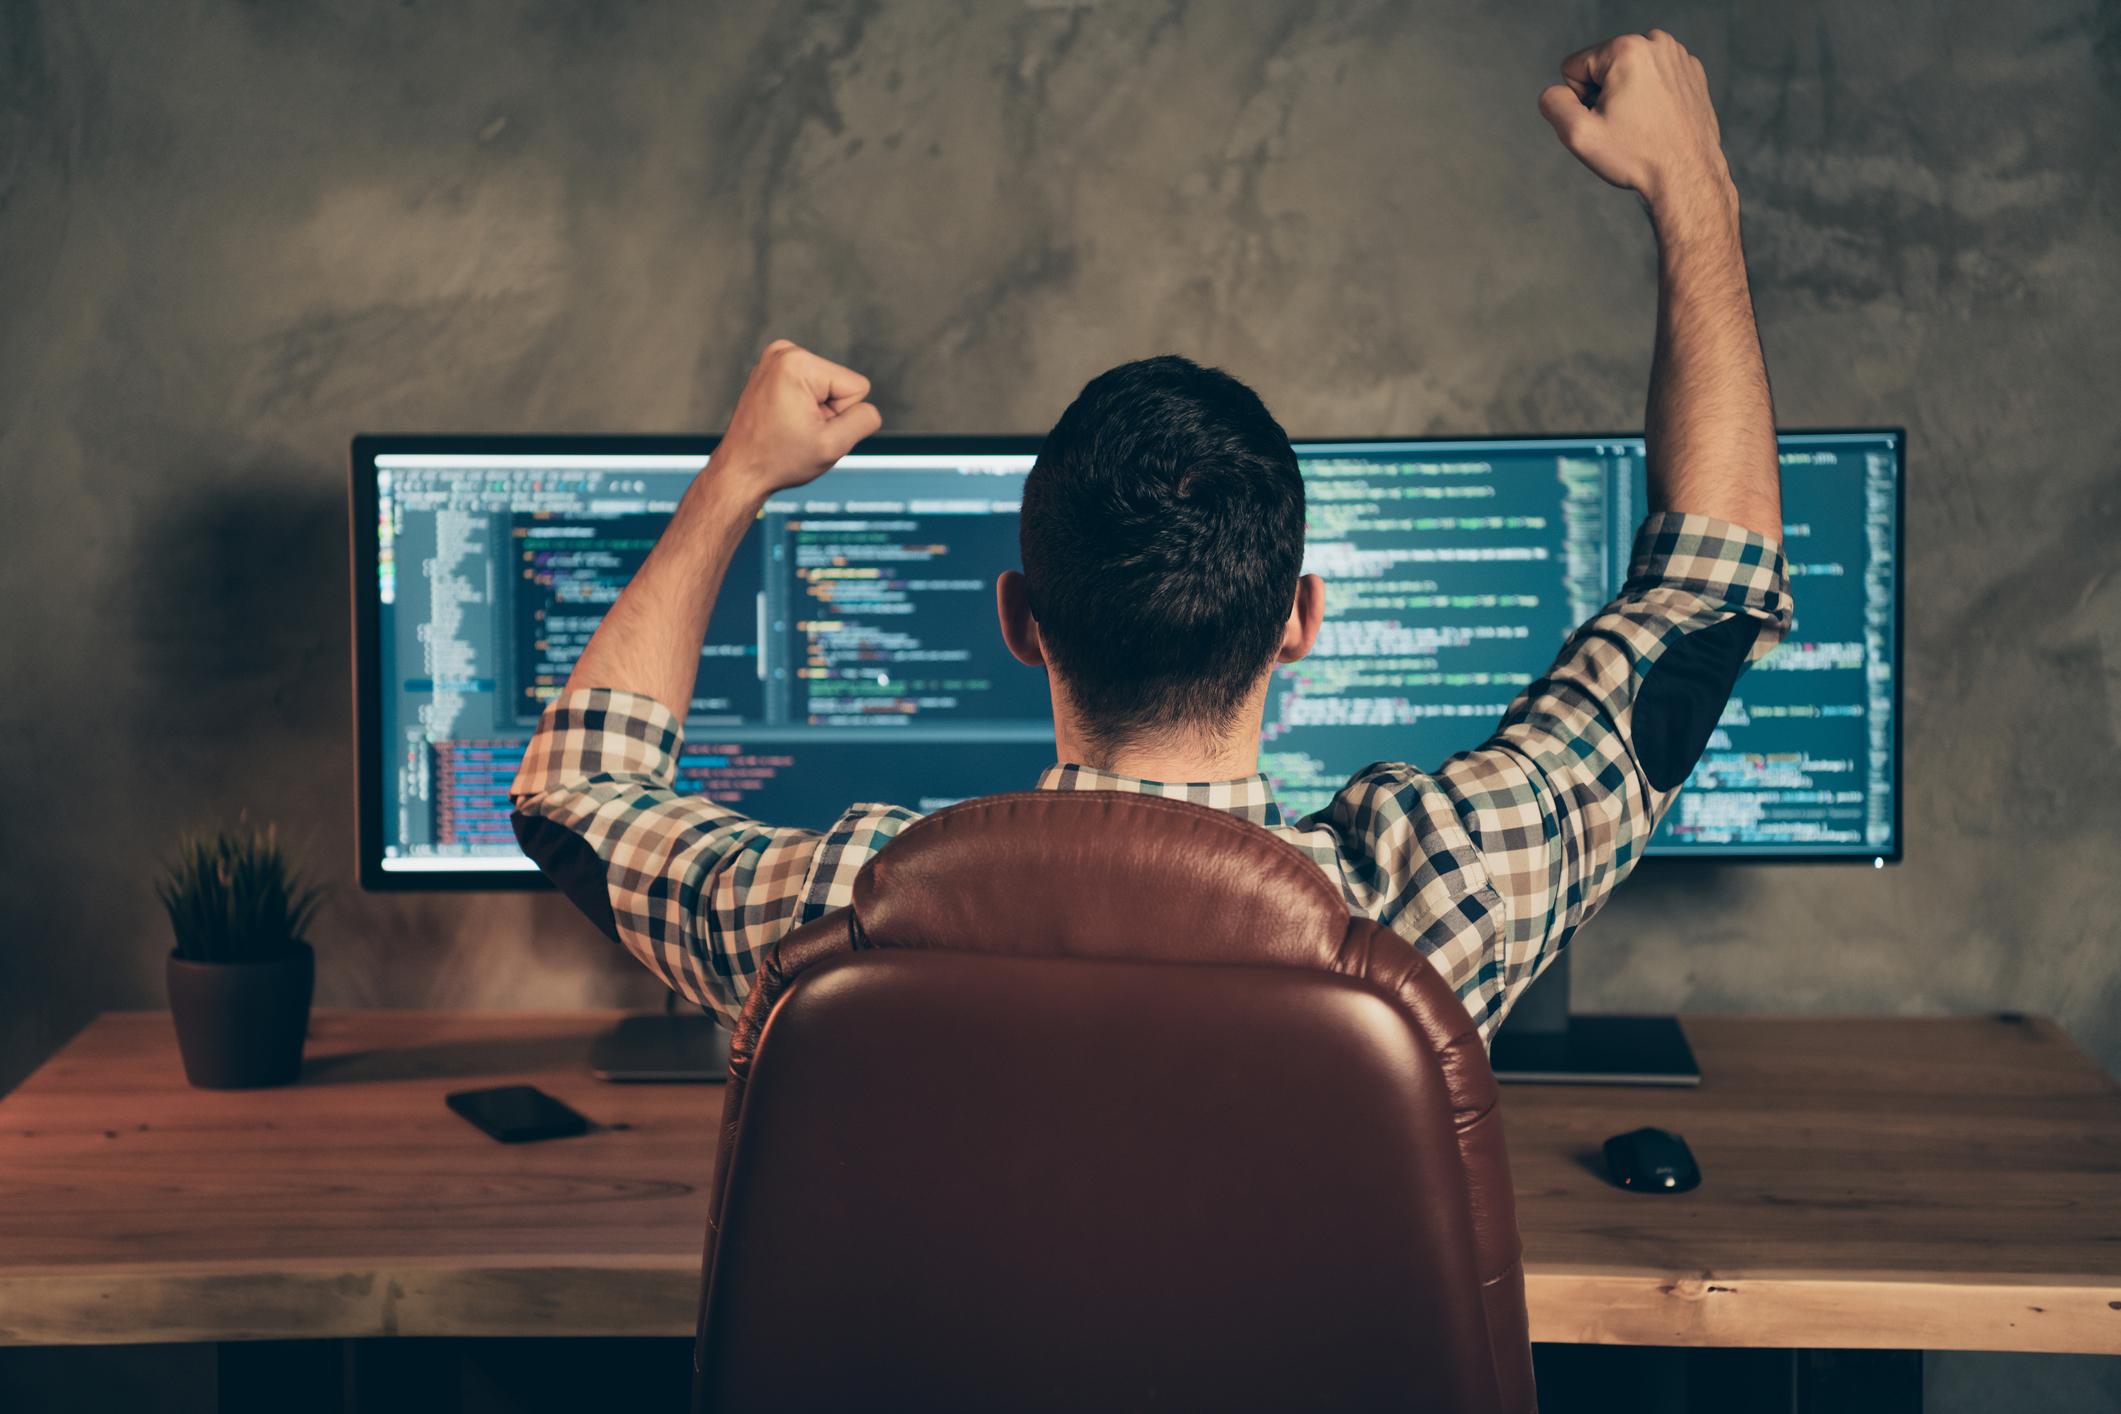 Senior software engineer – Rotterdam, The Netherlands